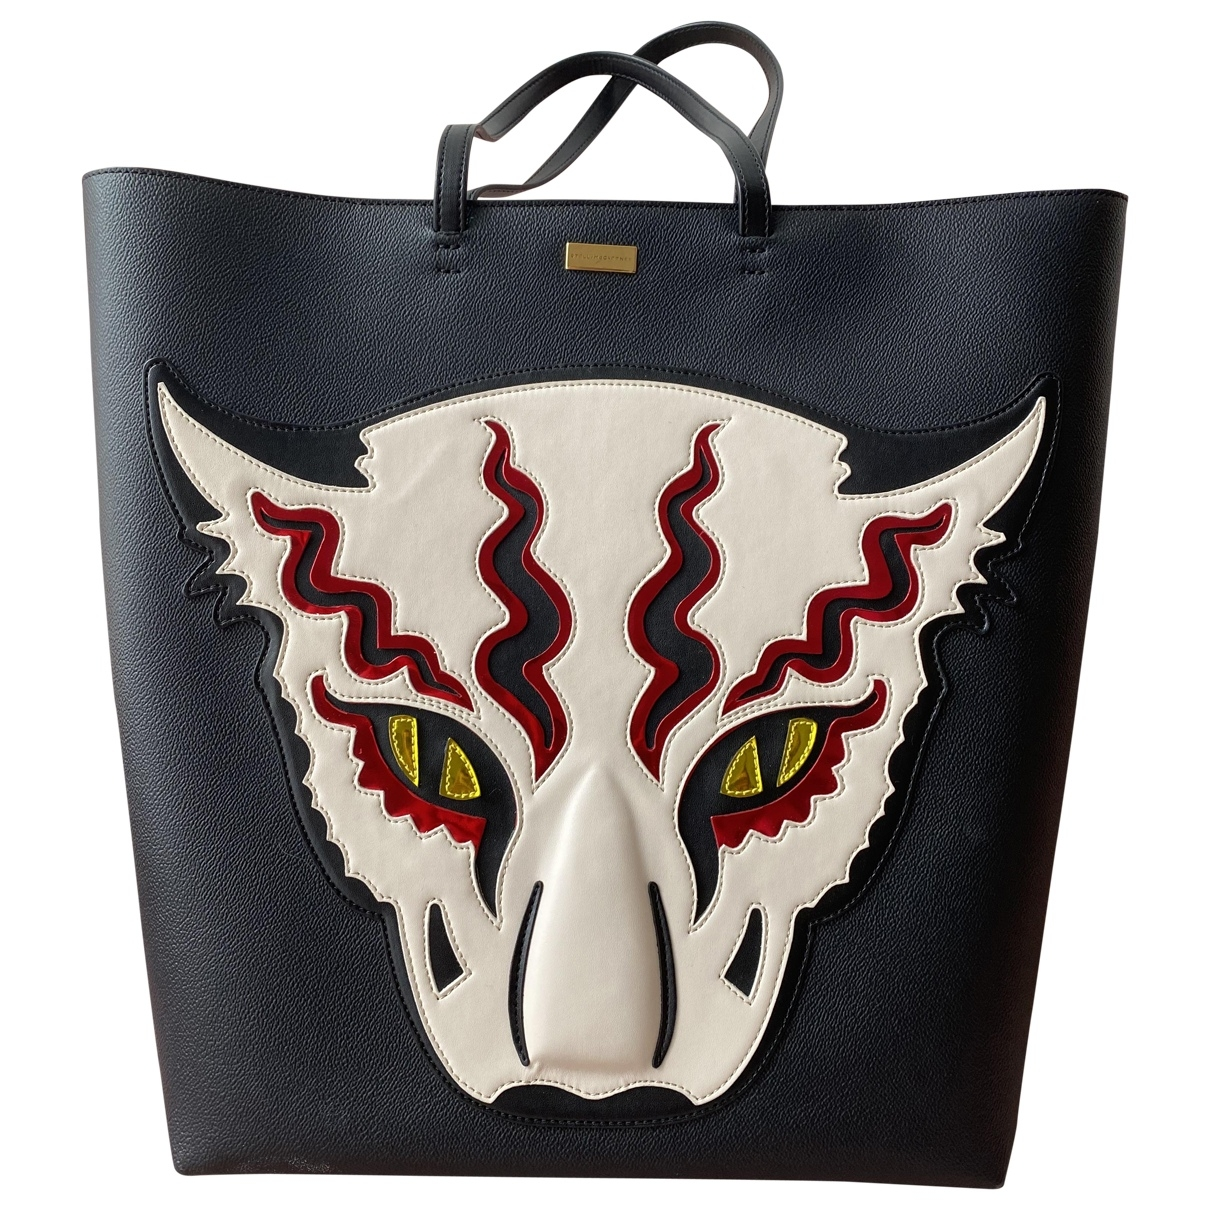 Stella Mccartney \N Black handbag for Women \N